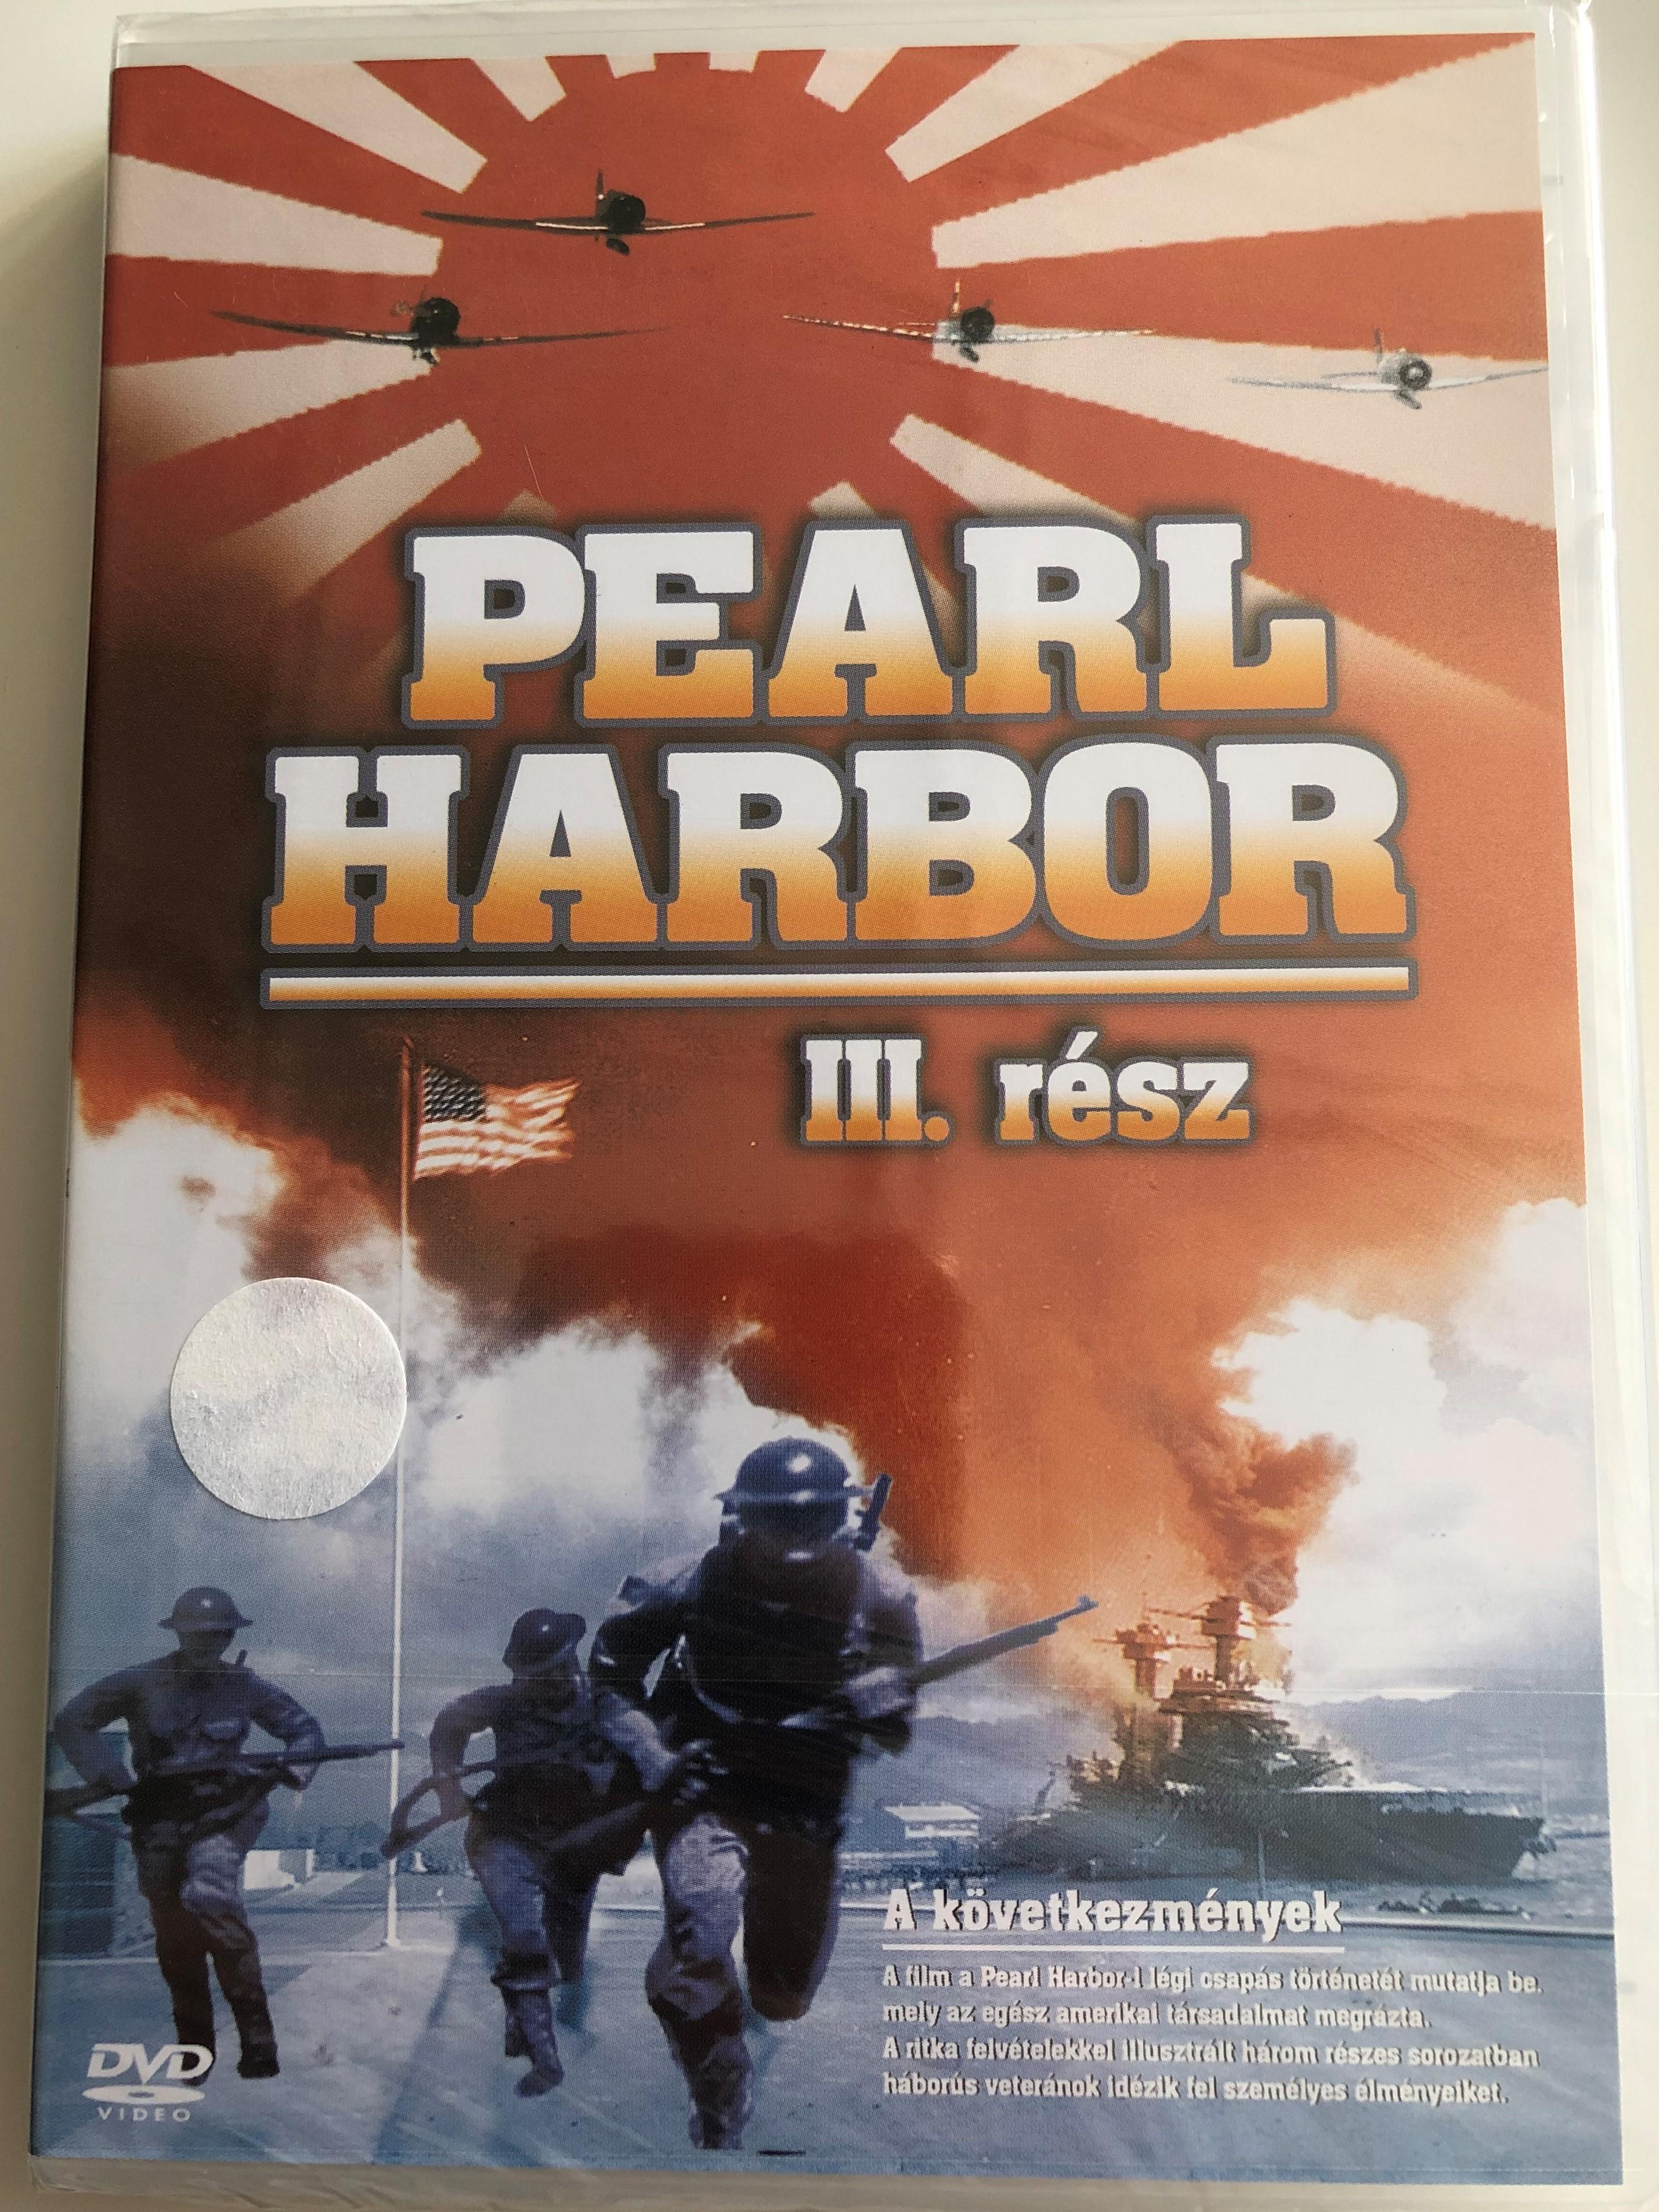 pearl-harbor-part-3-dvd-2004-pearl-harbor-iii.-r-sz-a-k-vetkezm-nyek-1.jpg